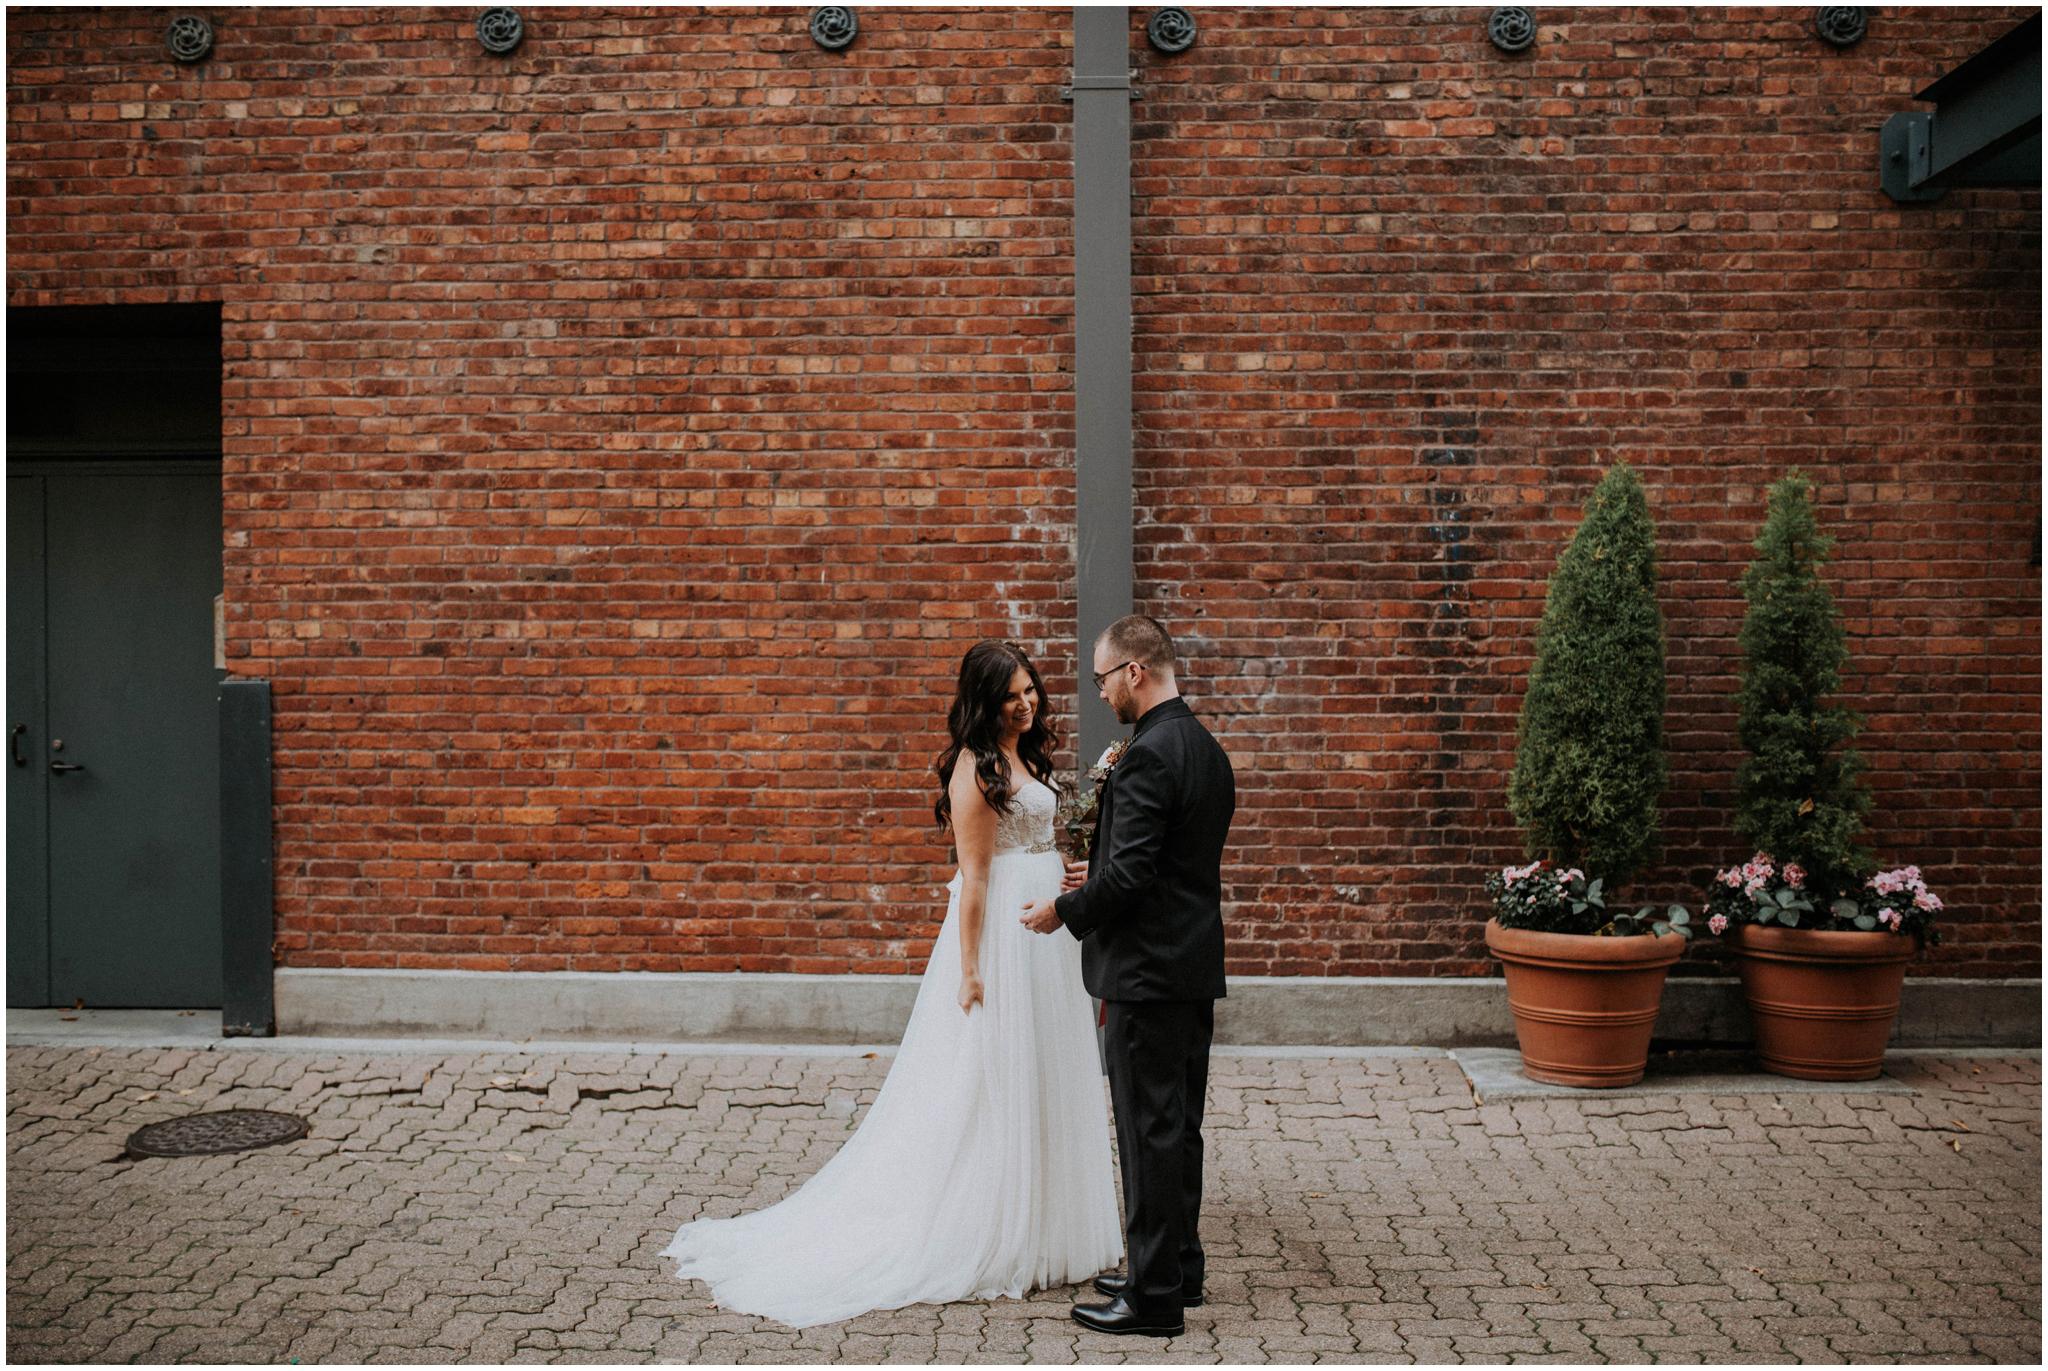 danny+mackenzie+downtown-seattle-axis-wedding-seattle-photographer-031.jpg